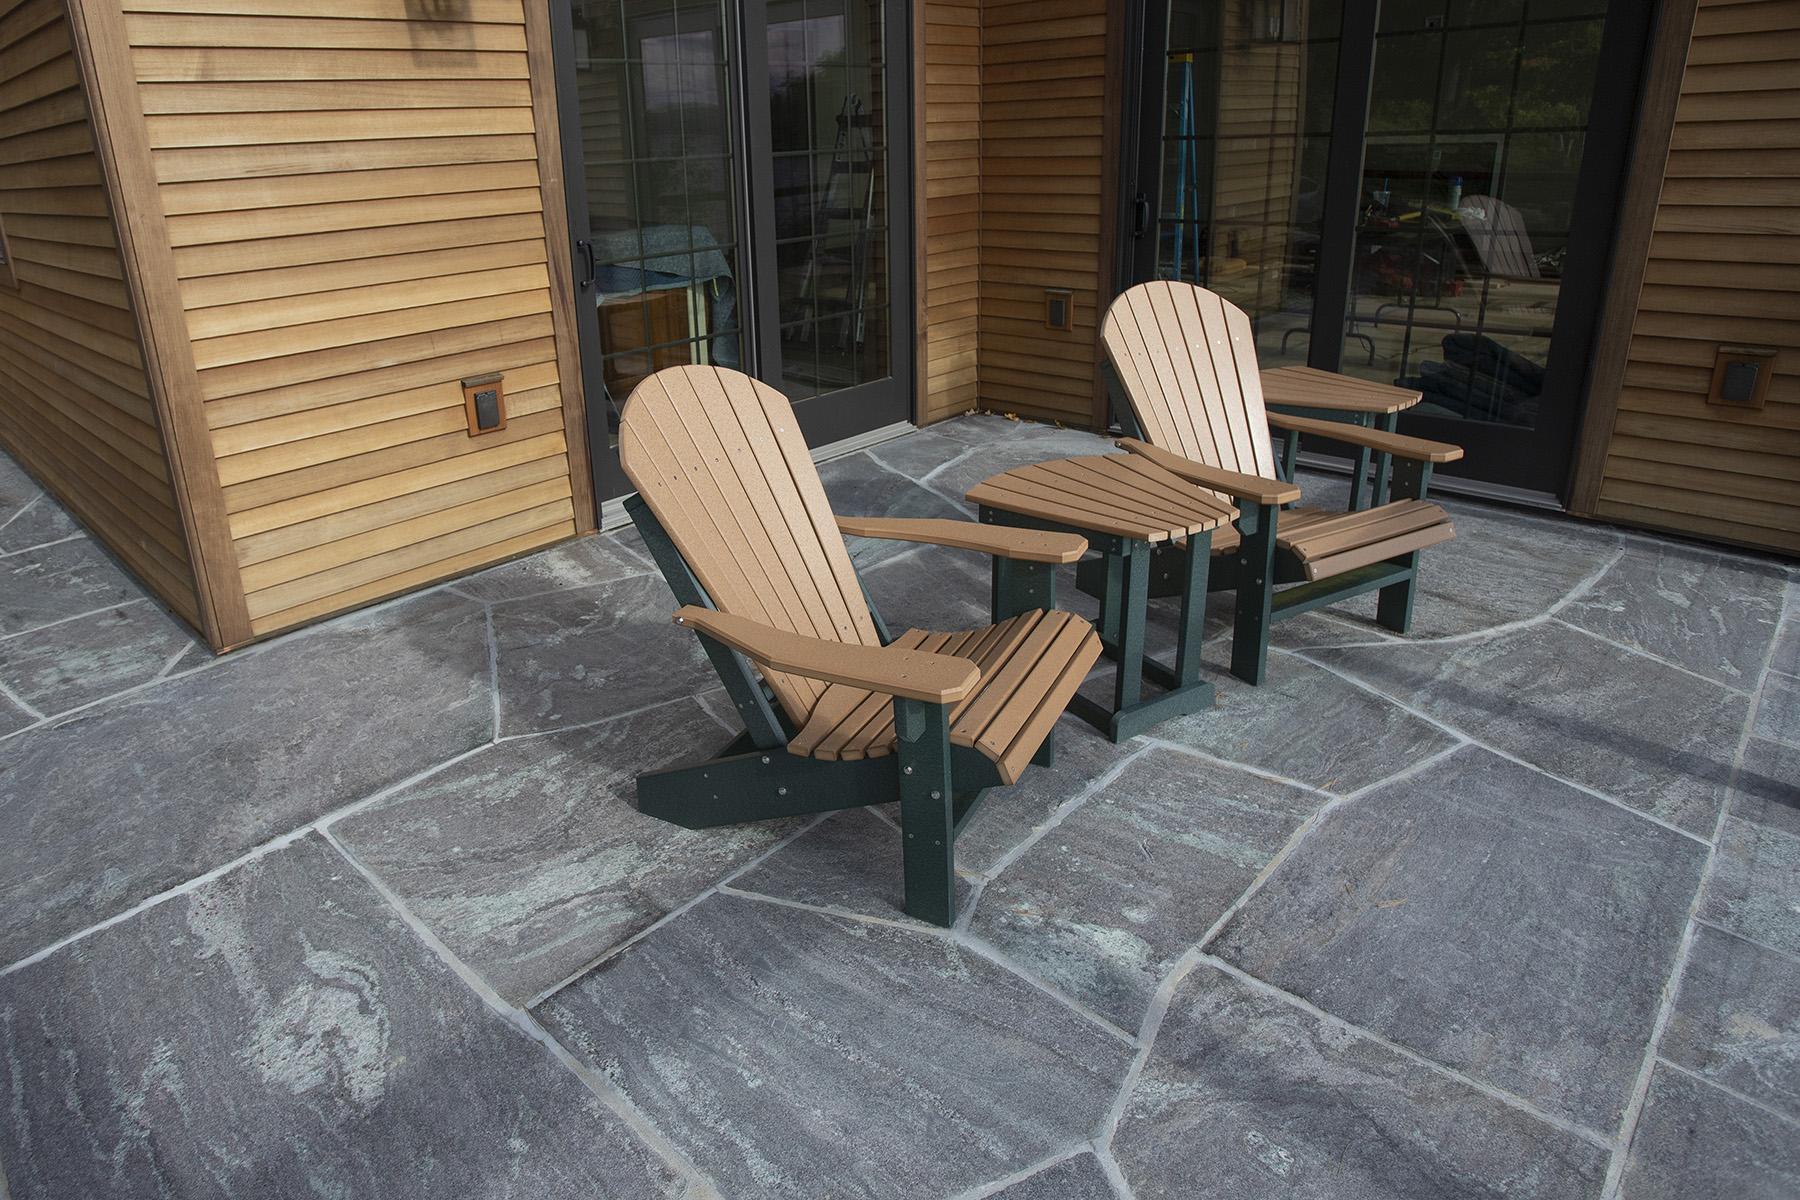 adirondack chairs atop stone sidewalk